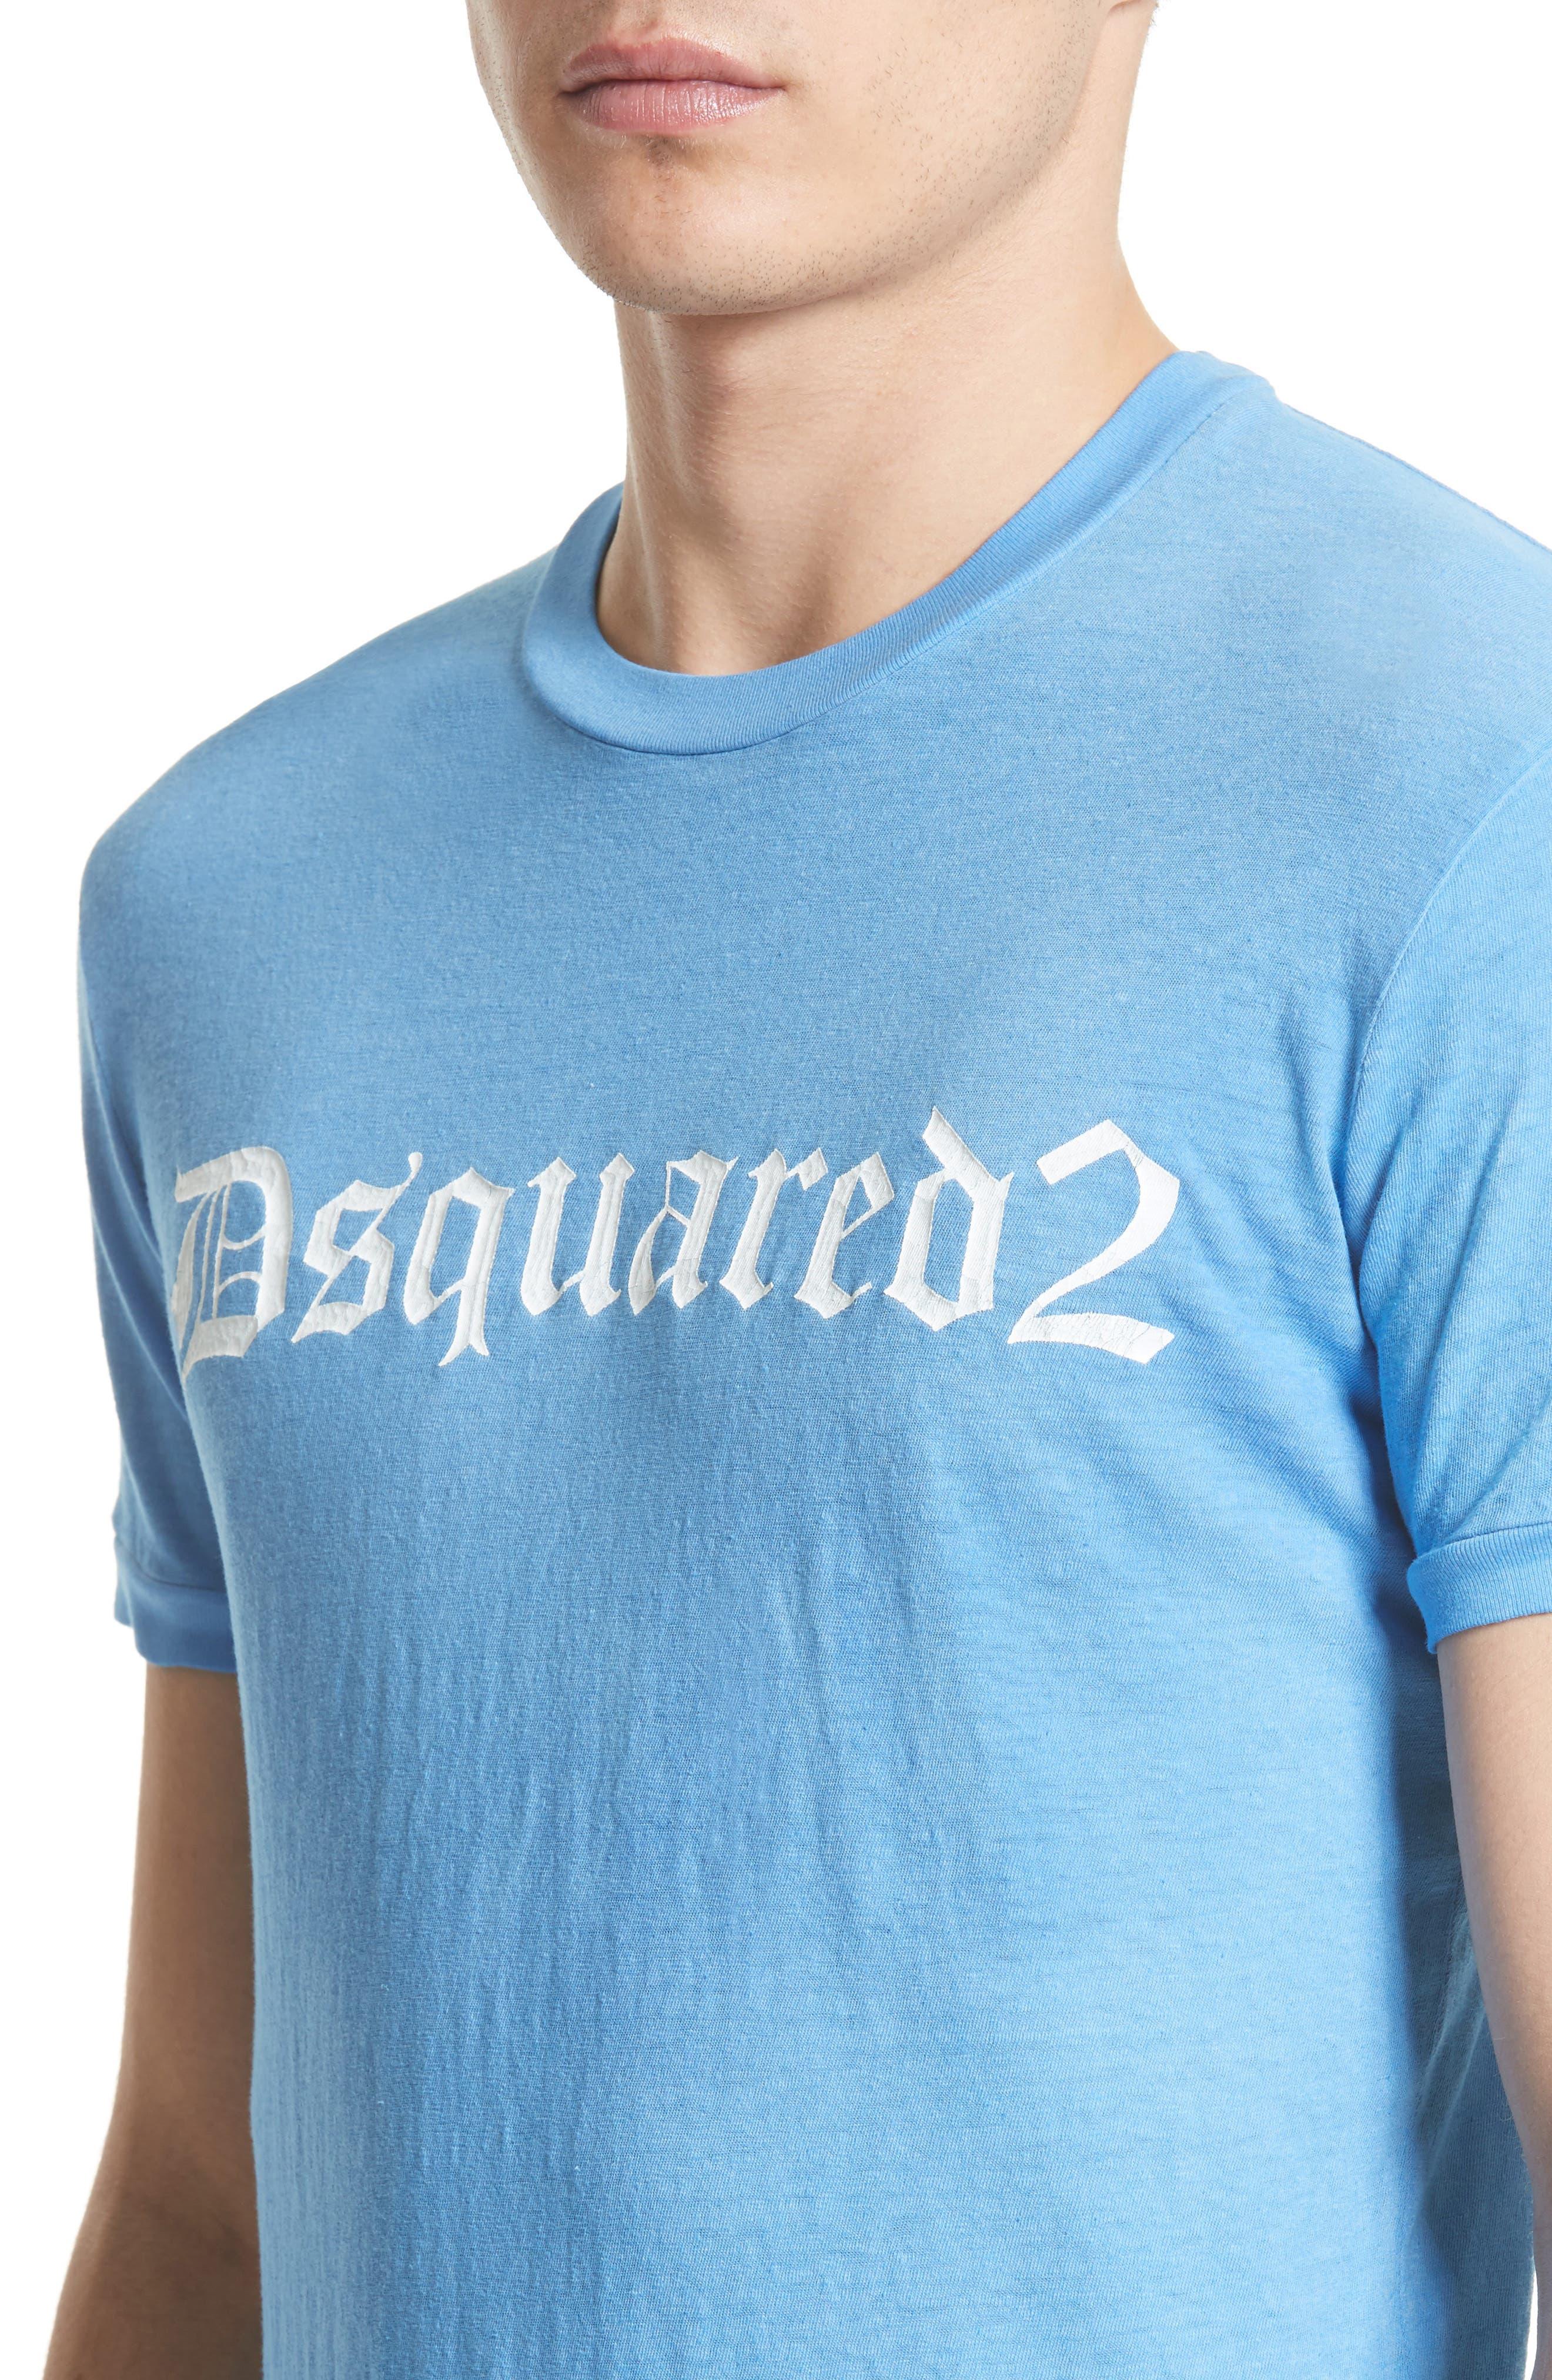 Dquared2 Cotton T-Shirt,                             Alternate thumbnail 4, color,                             449